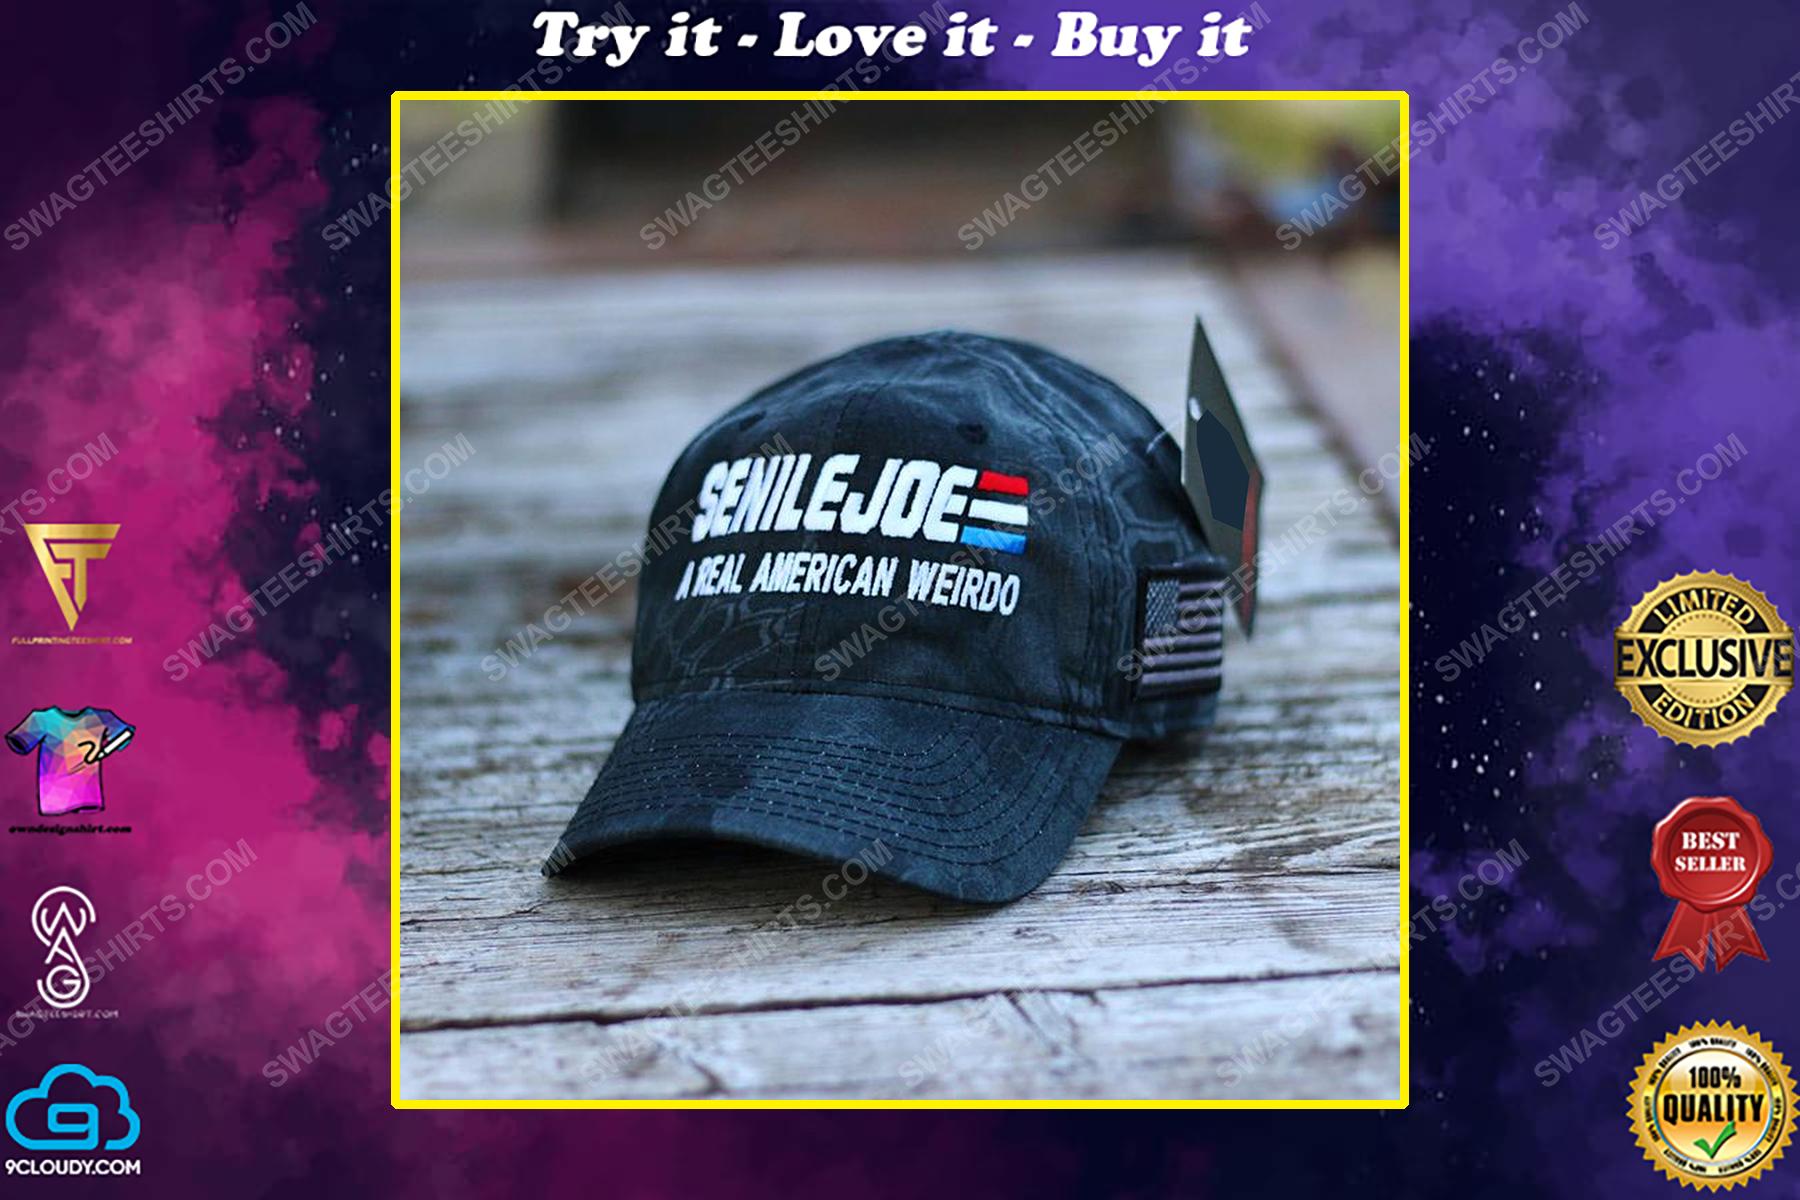 Senile joe a real american weirdo full print classic hat